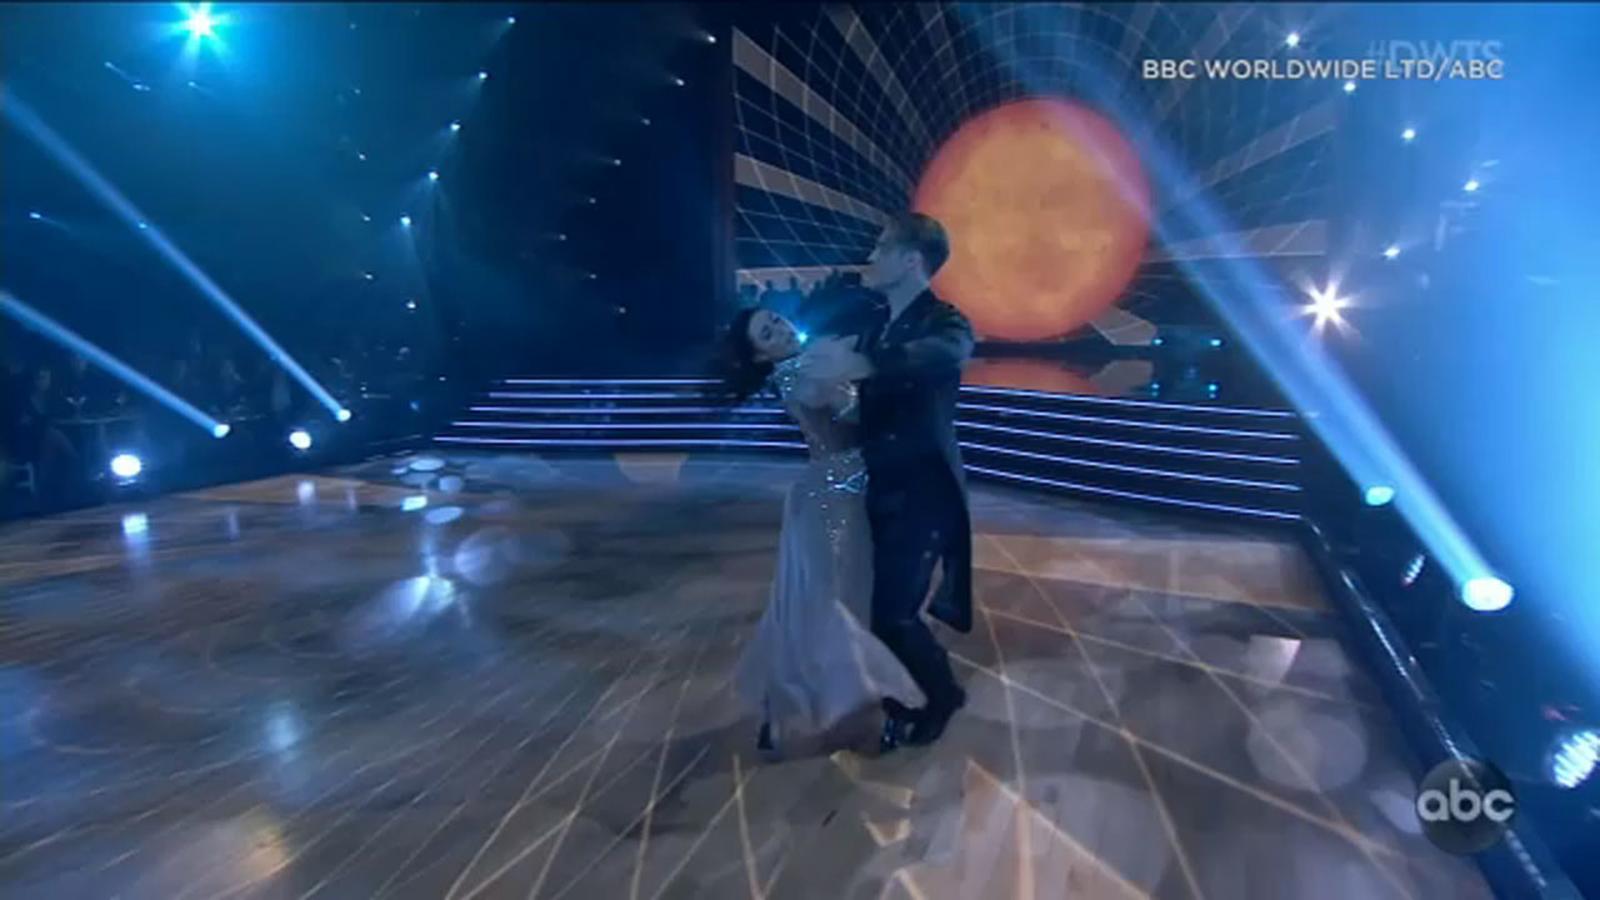 'Dancing with the Stars' semifinals recap: Emotional night on the dance floor ends in heartbreak - WLS-TV